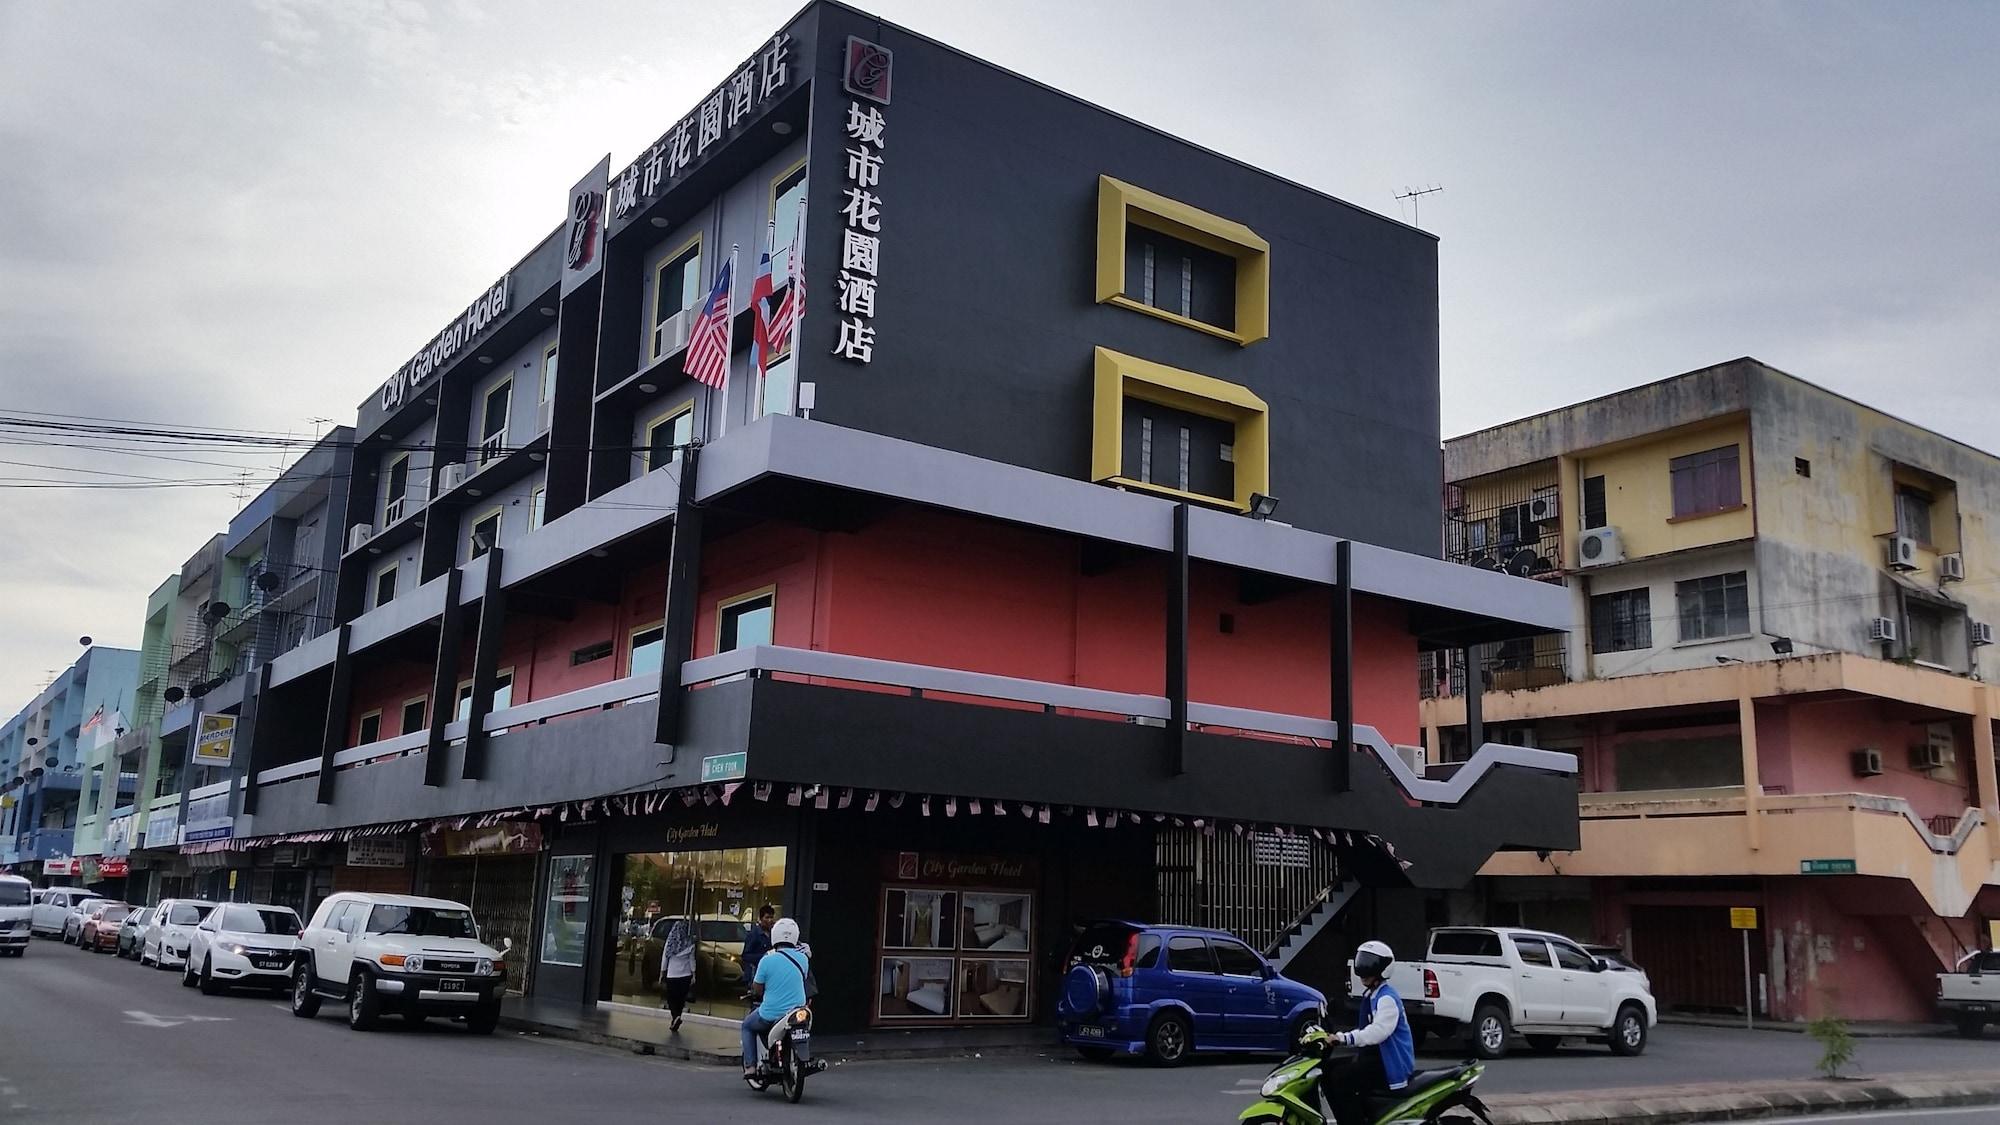 City Garden Hotel, Tawau